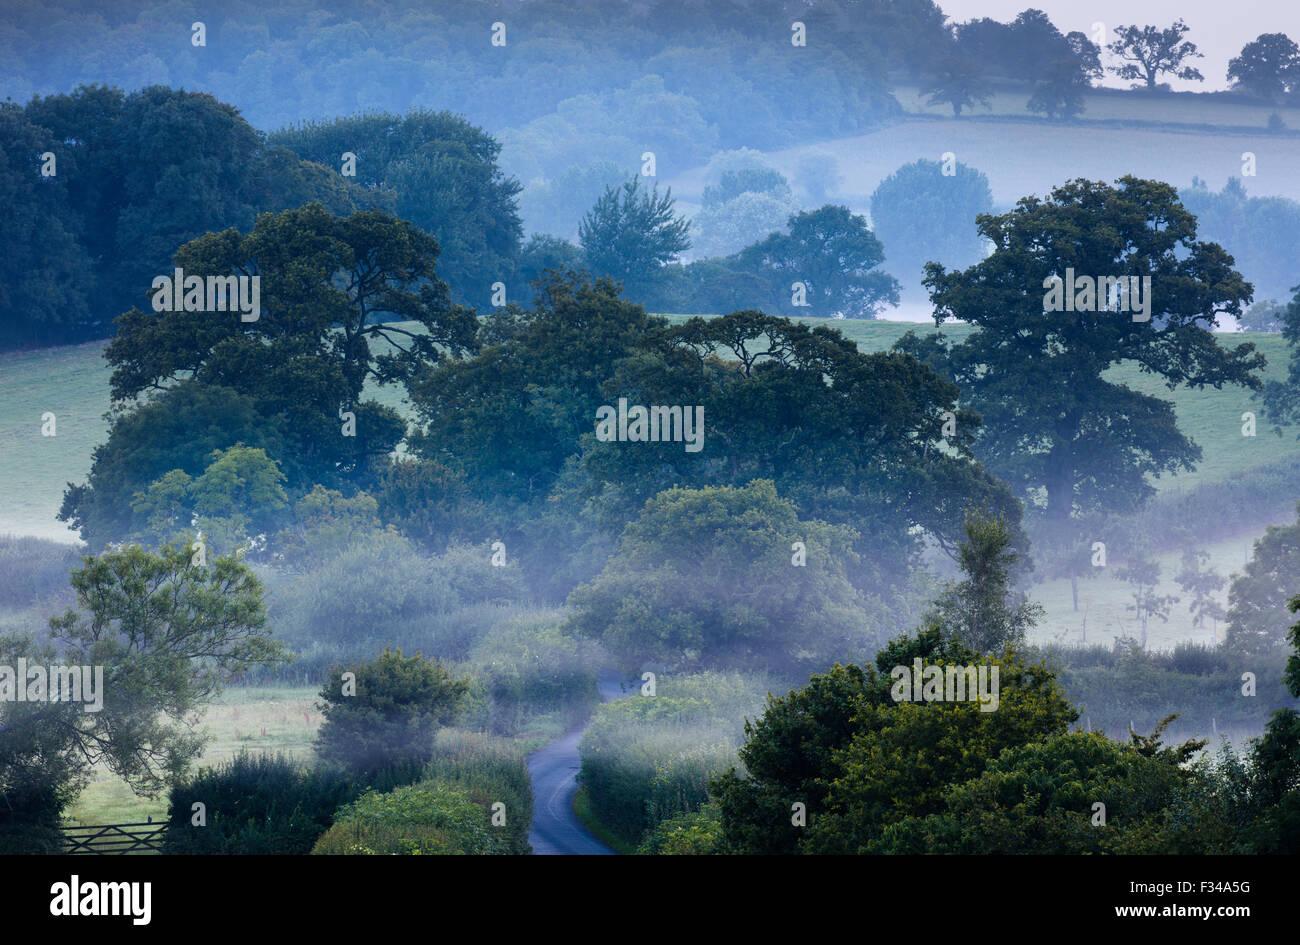 a misty morning near Milborne Wick, Somerset, England, UK - Stock Image